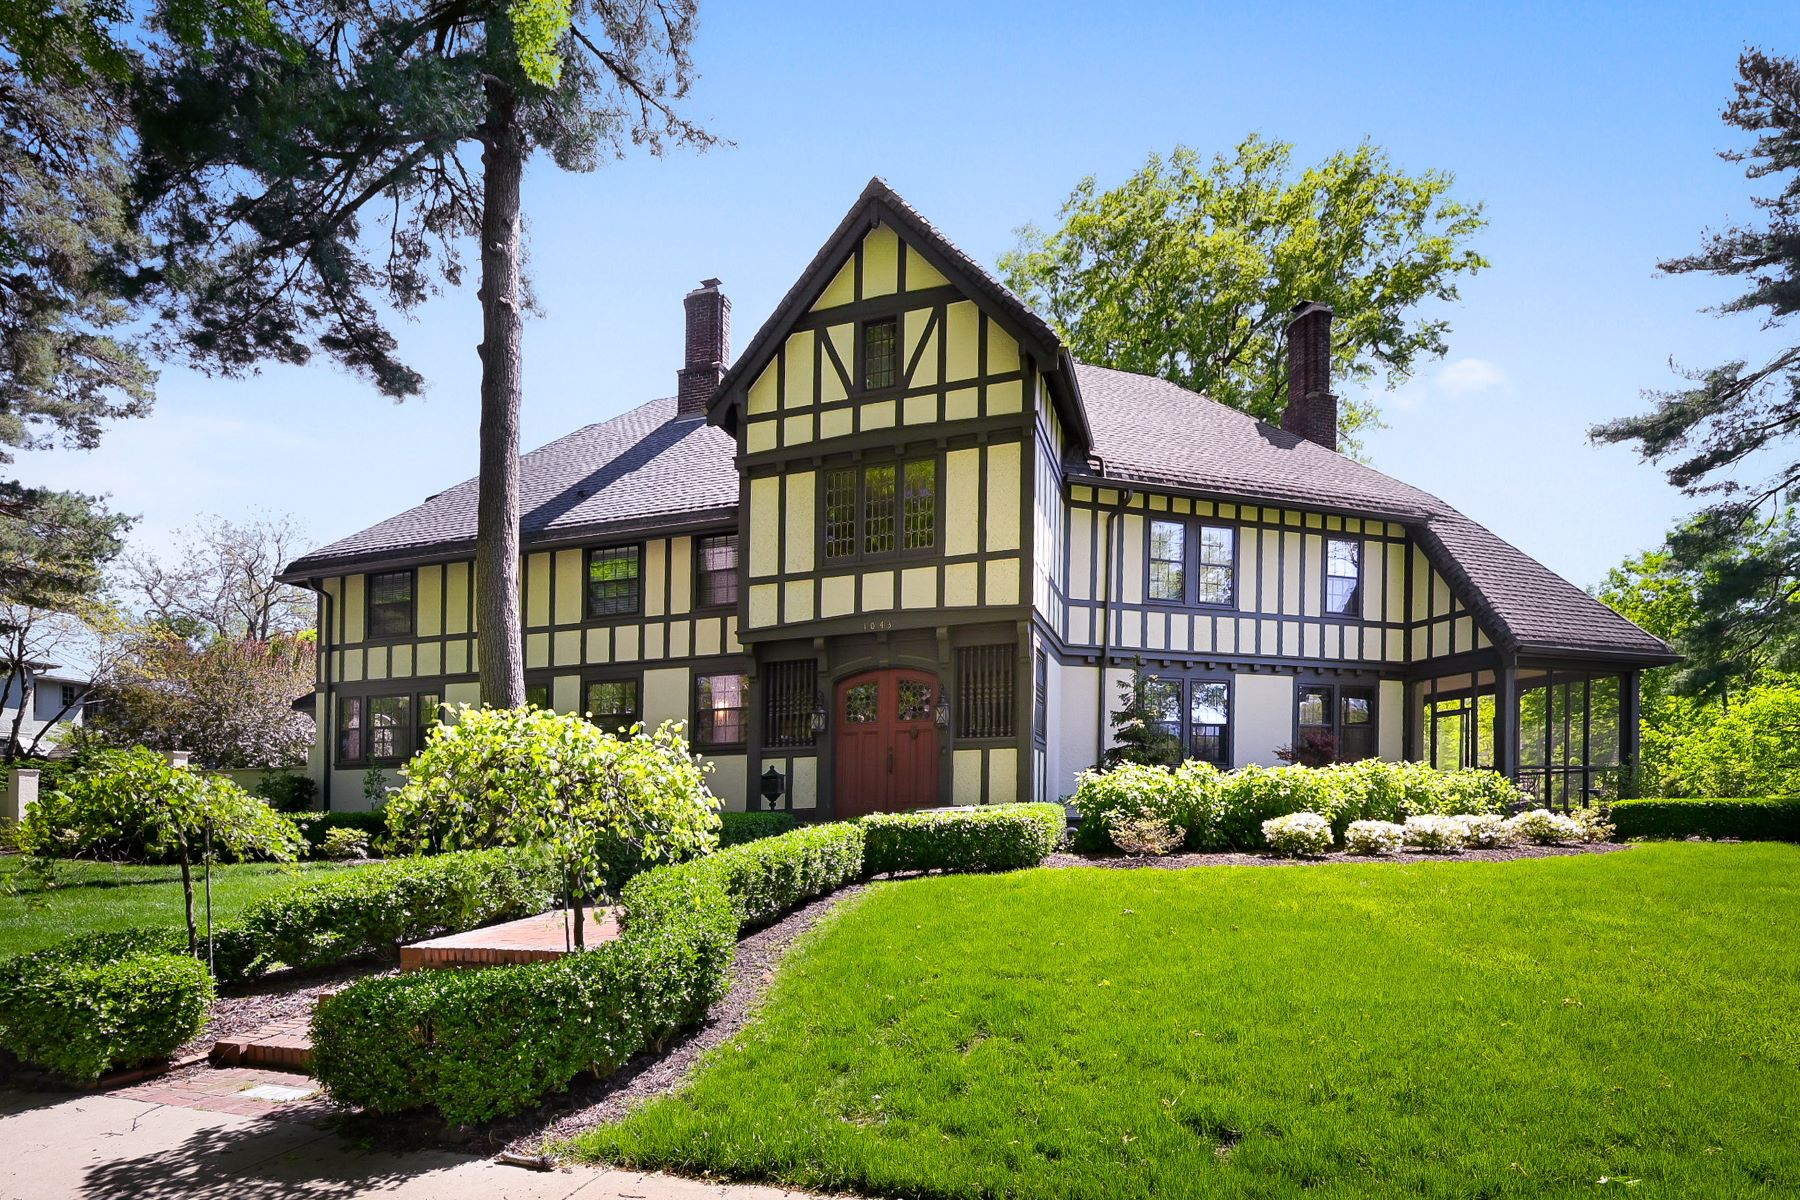 Single Family Homes for Active at Stunning Landmark Tudor 1043 West 57th Terrace Kansas City, Missouri 64113 United States